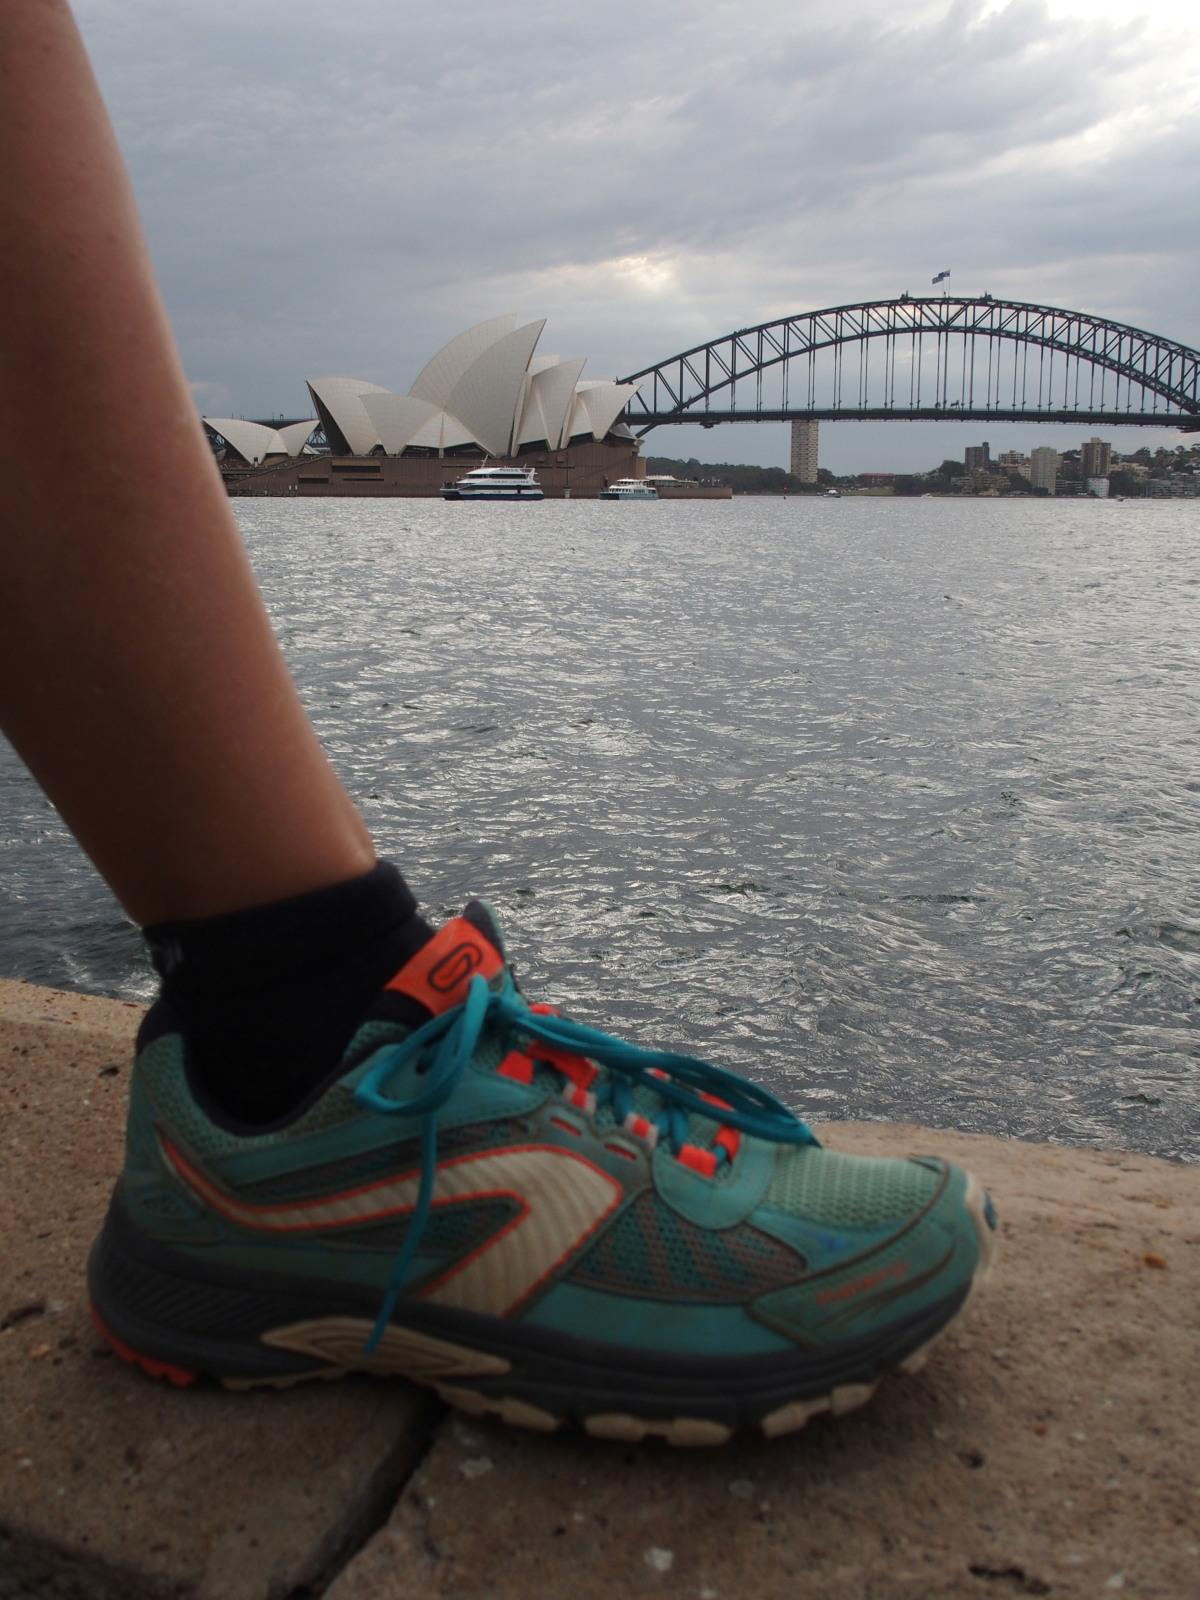 Chaussures Kalenji Guinou - Sydney - Australie